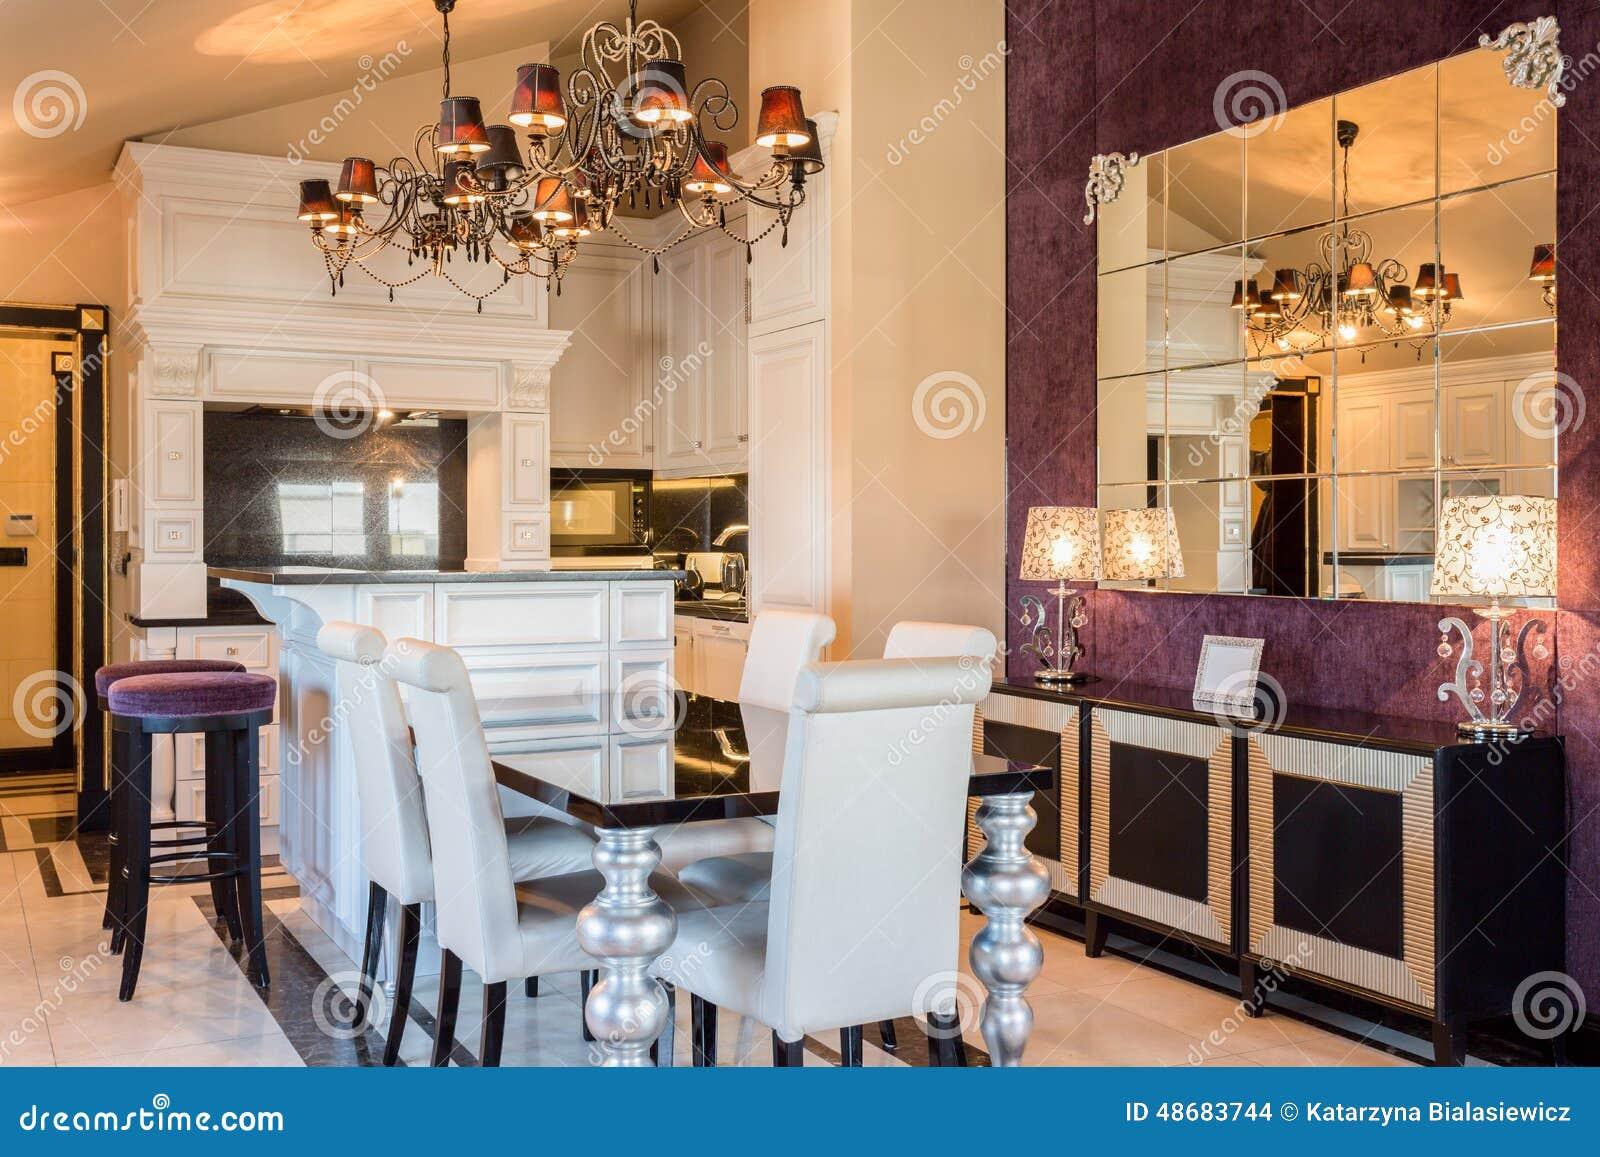 Duur huis in barokke stijl stock foto afbeelding 48683744 - Barokke stijl kamer ...